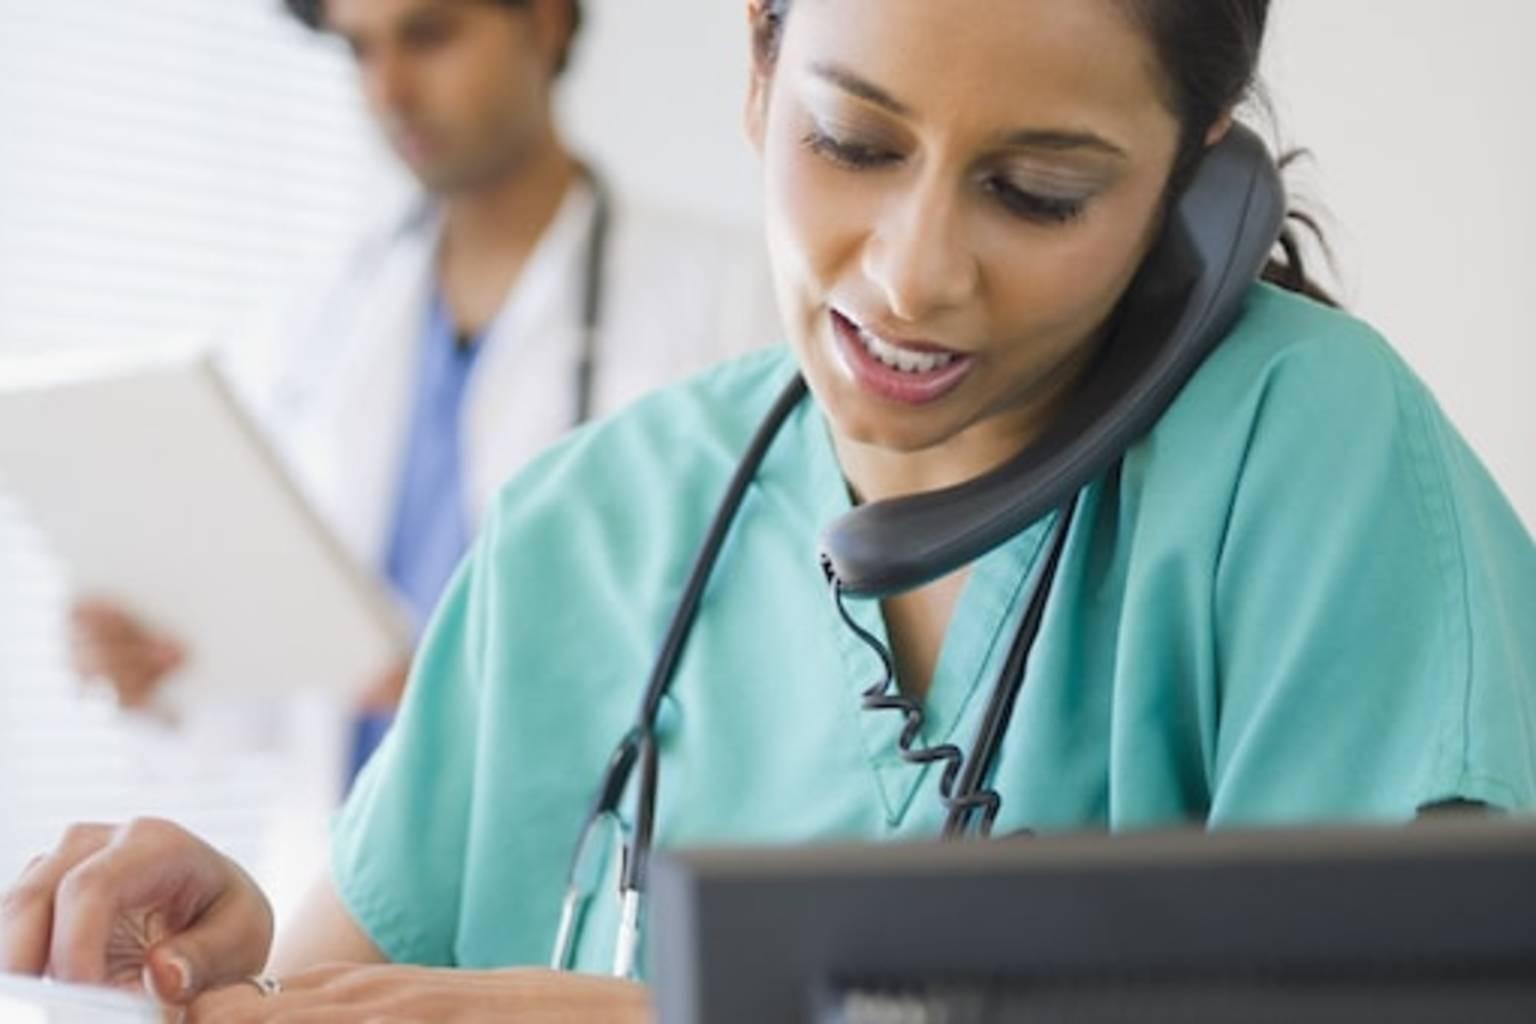 mediregs-healthcare-compliance-software-1536-1024